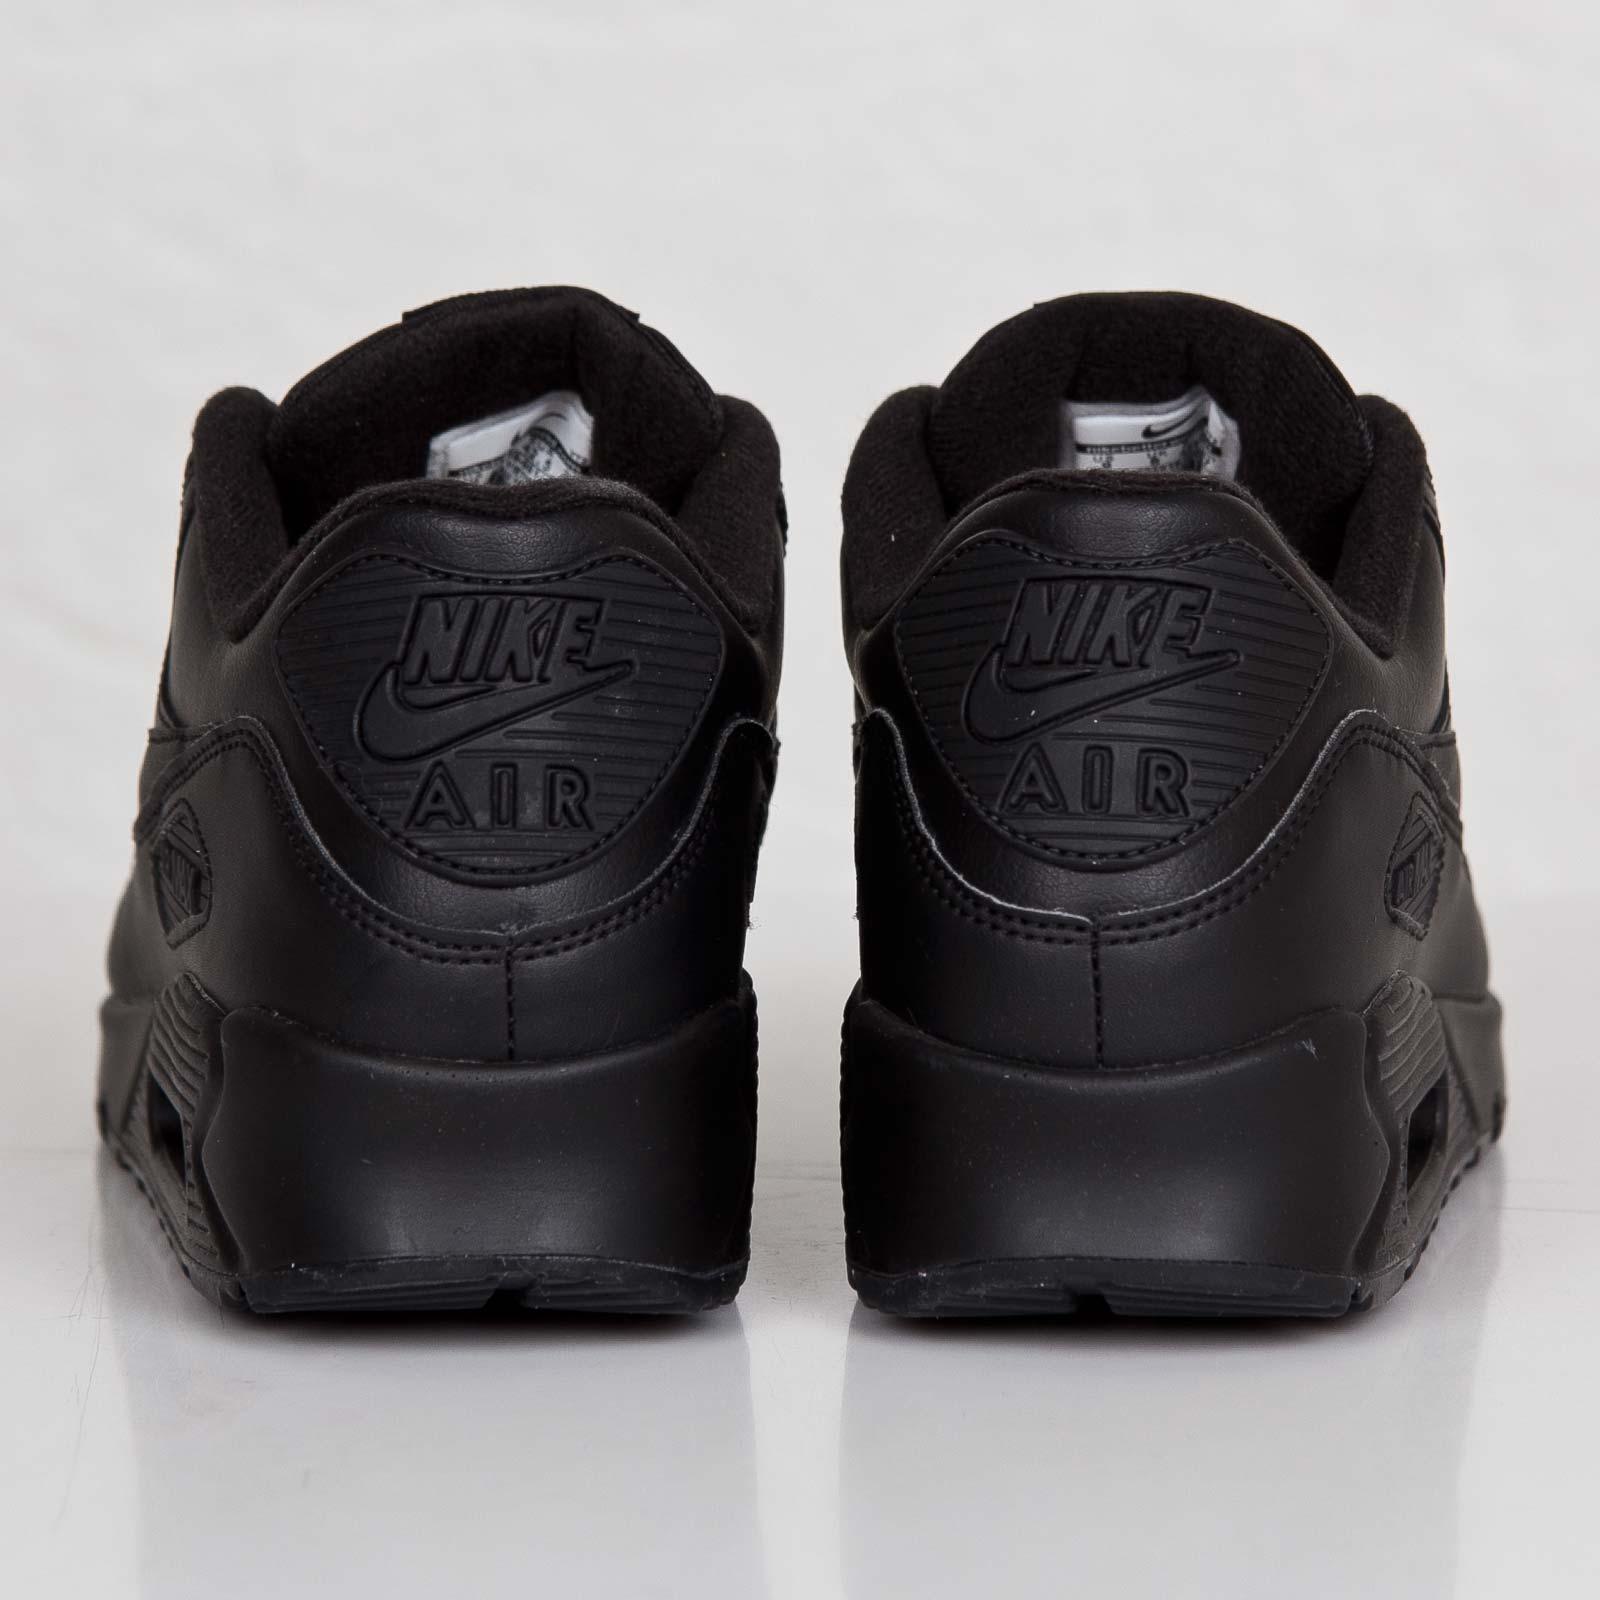 sale retailer ad2ff 46bd7 Nike Air Max 90 Leather - 302519-001 - Sneakersnstuff   sneakers    streetwear online since 1999